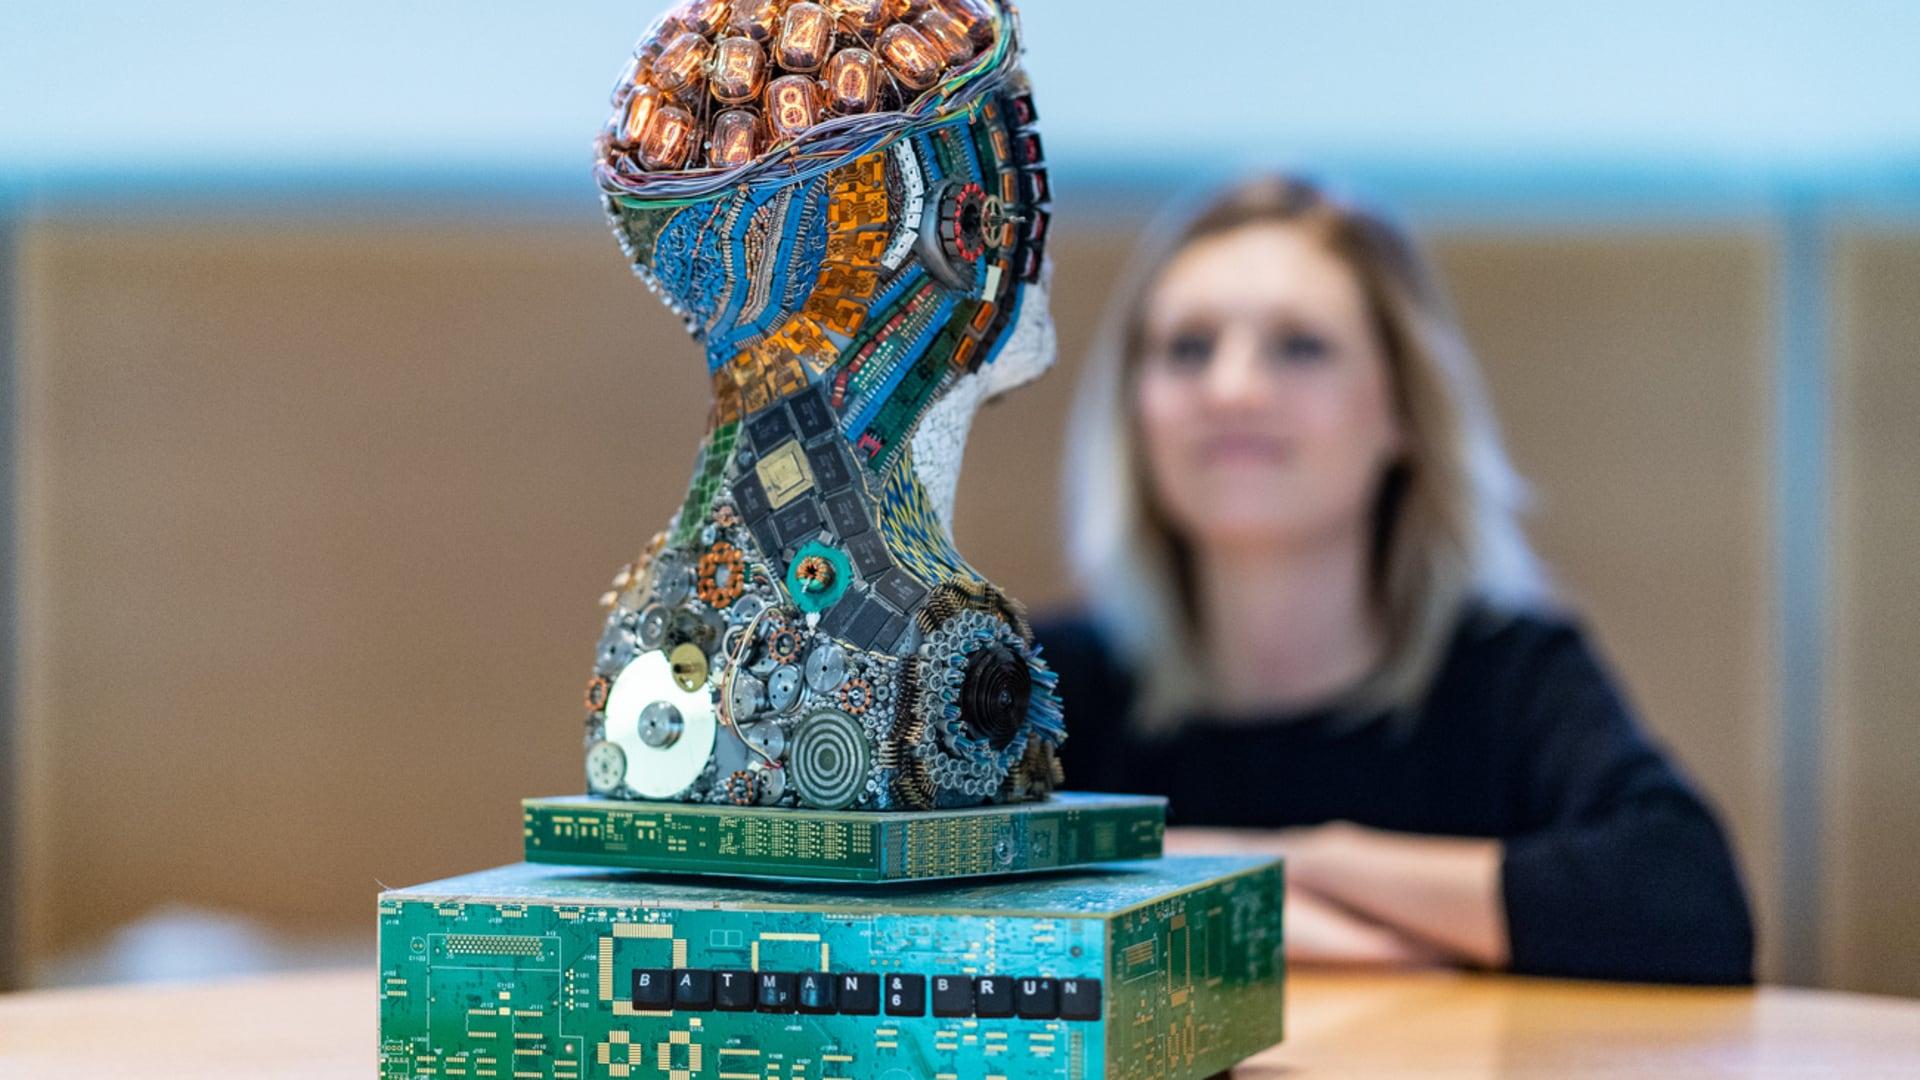 「AIは人の代わりにはならない」連邦工科大に新研究拠点 - SWI swissinfo.ch